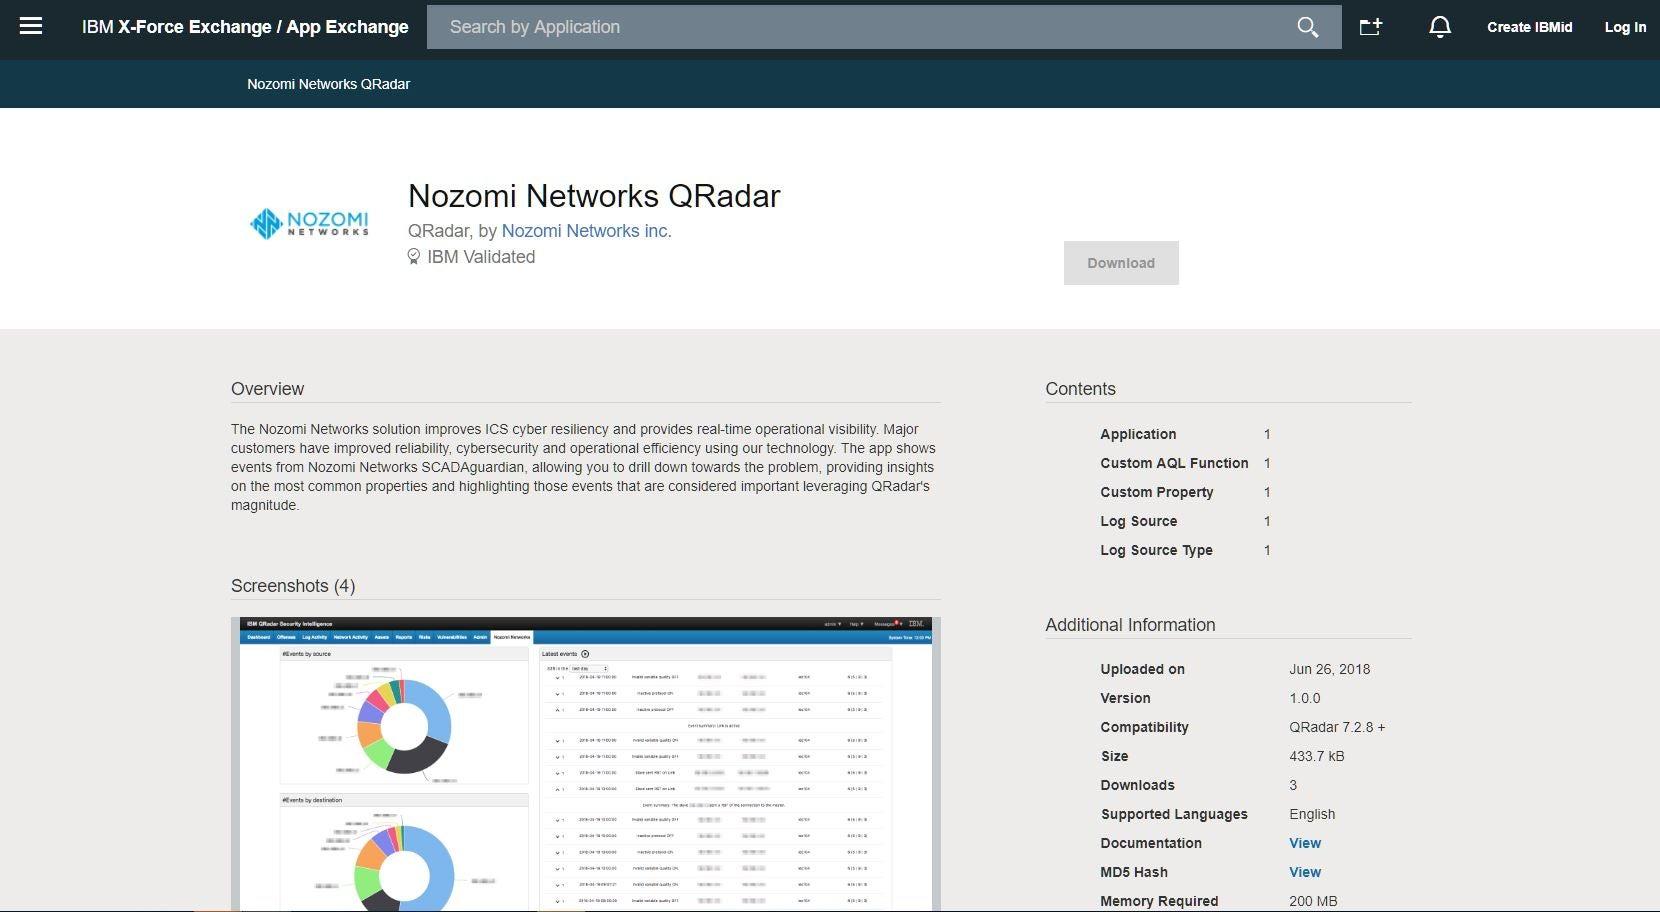 NN QRadar on IBM X-Force Exchange